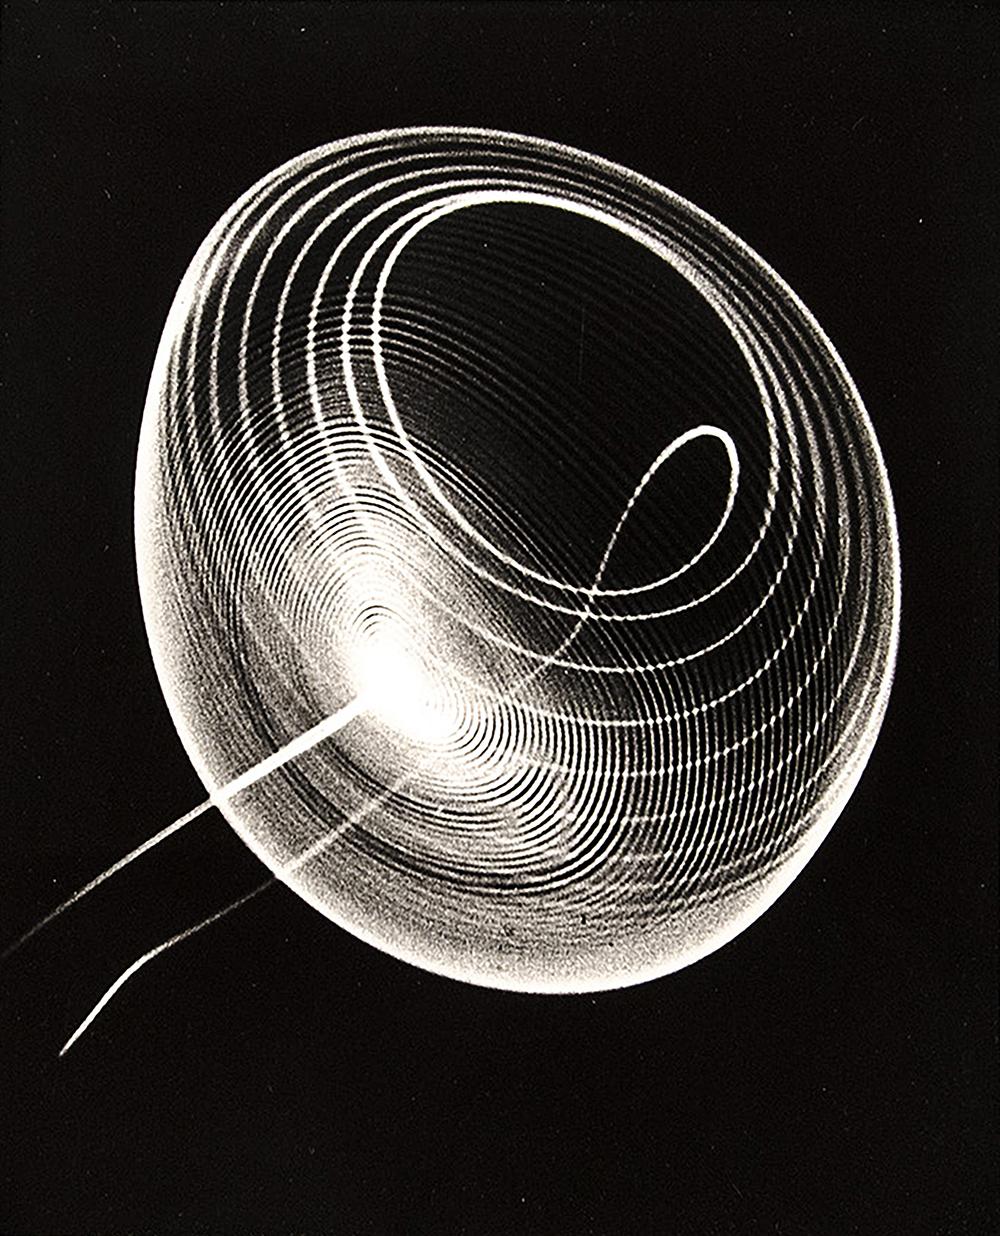 Ben Laposky, Oscillion No. 27, 1952.